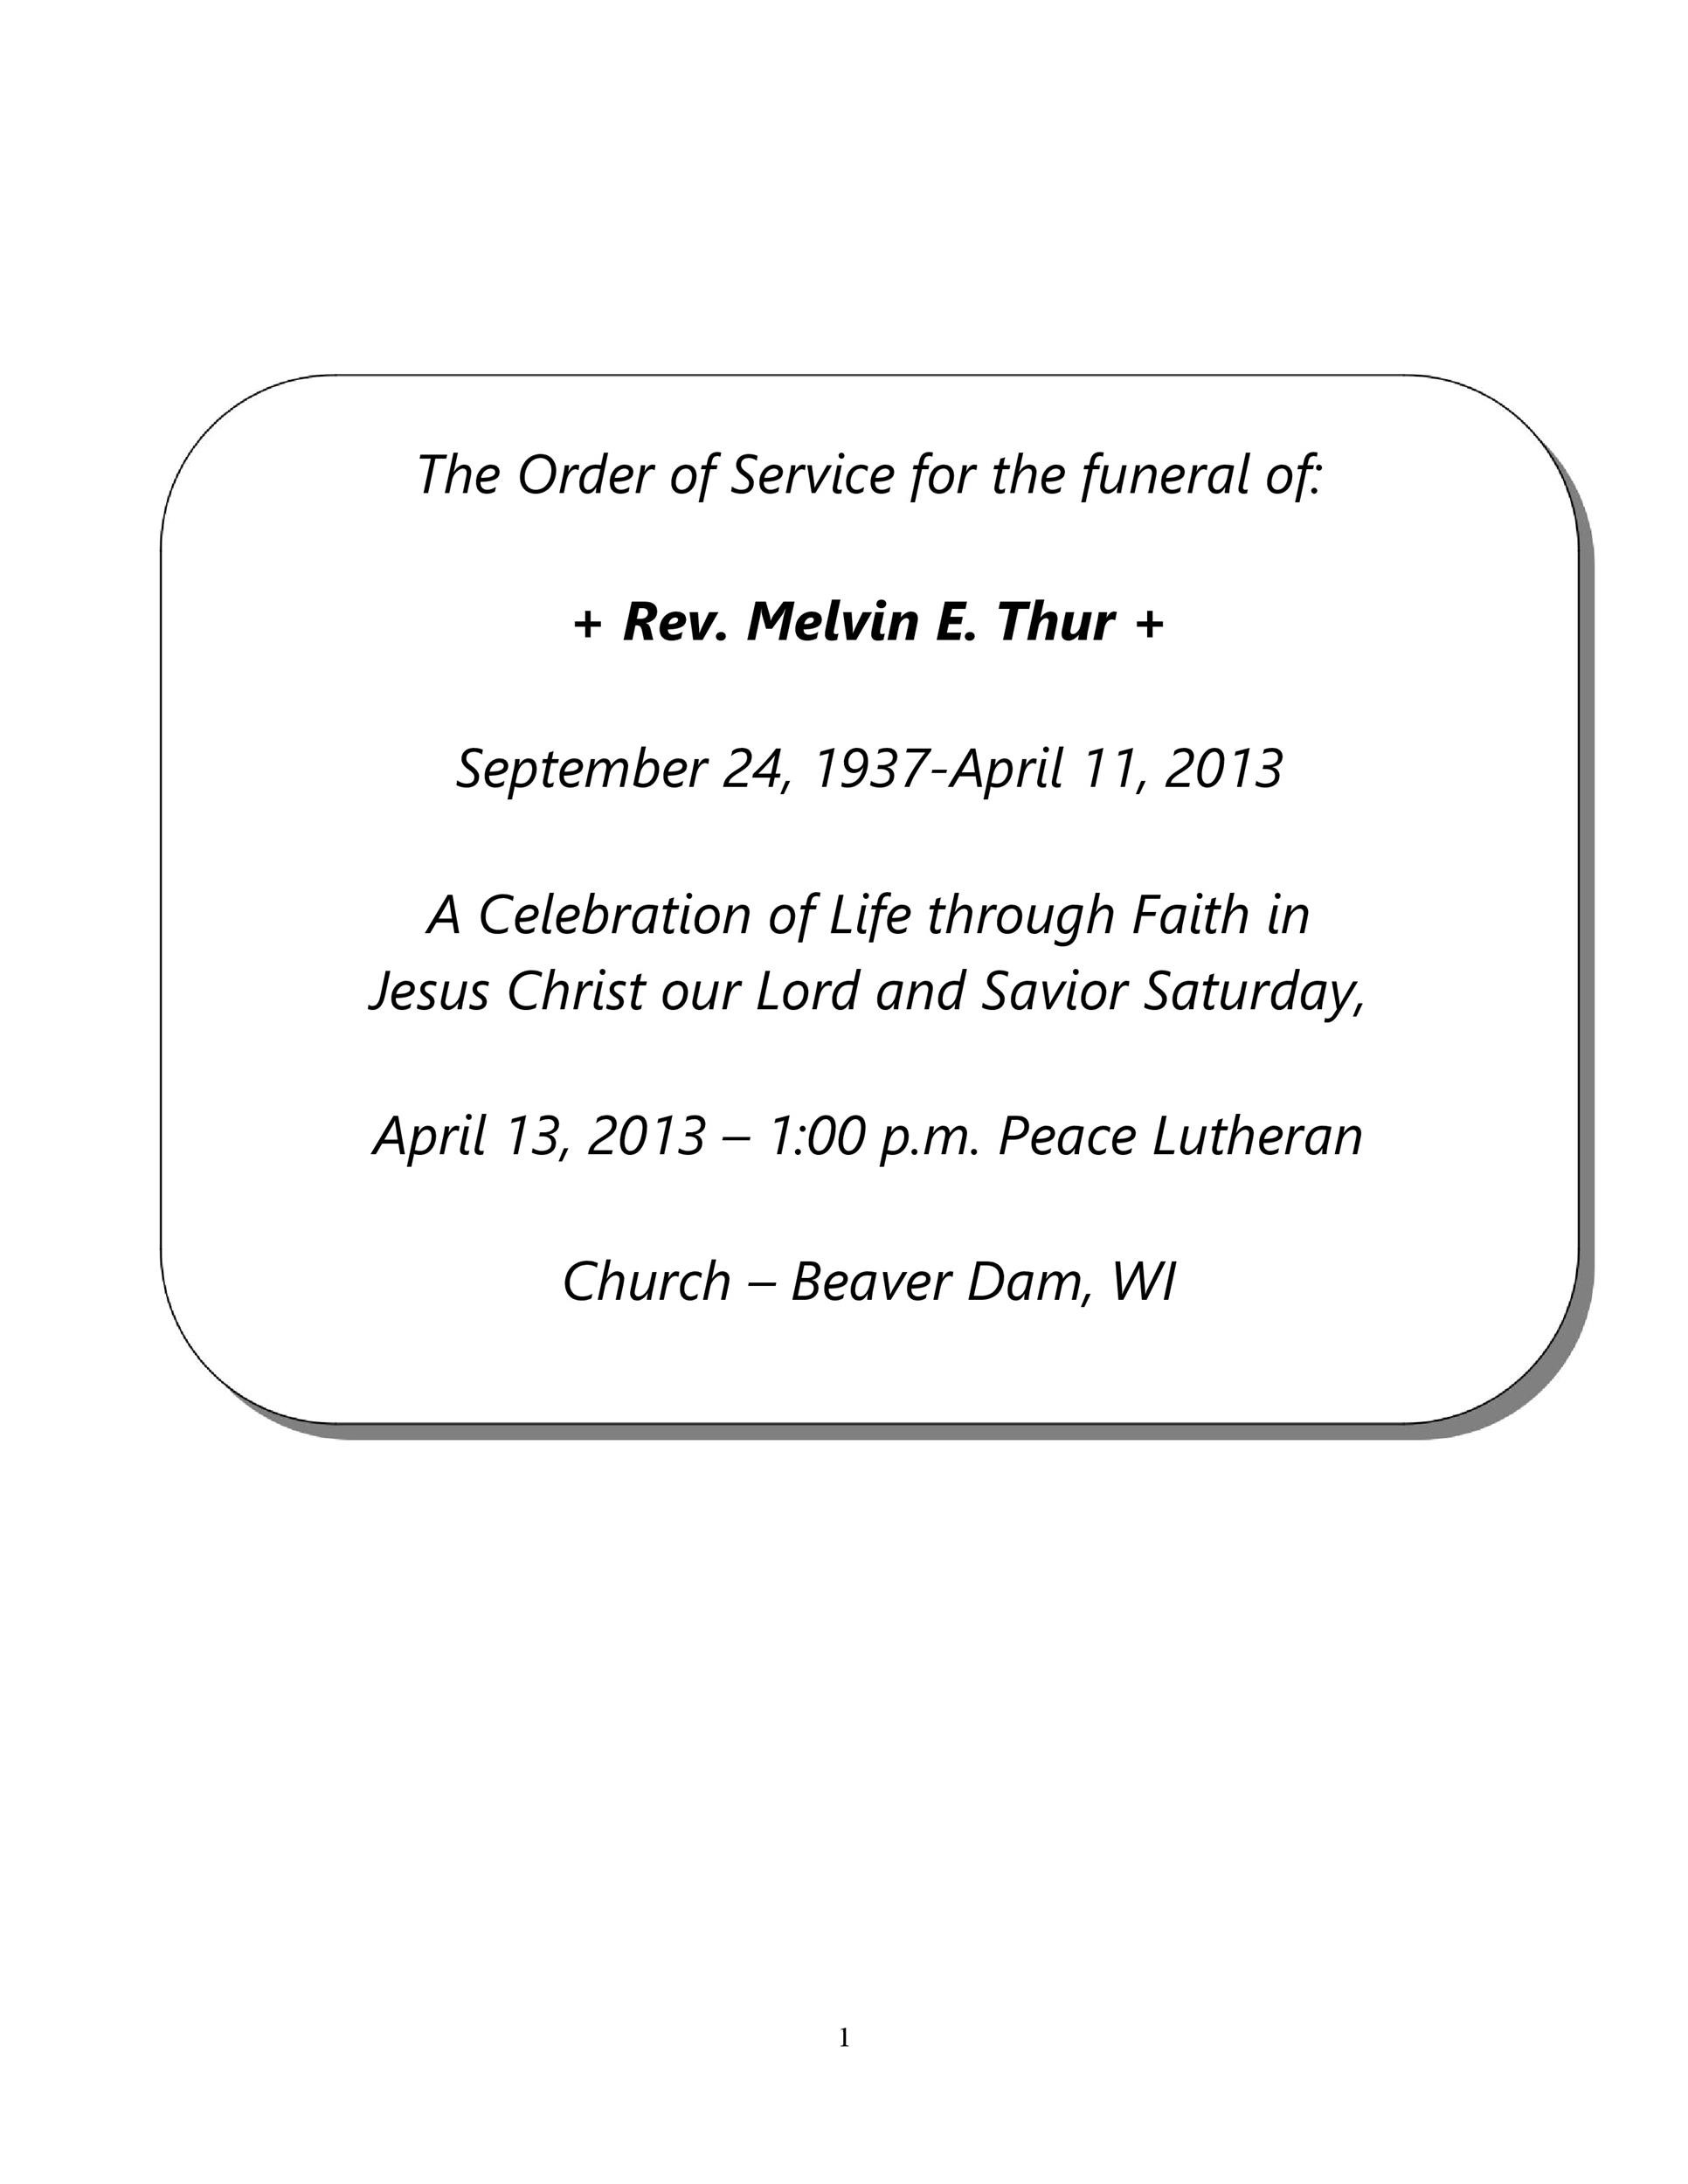 Free funeral program template 27